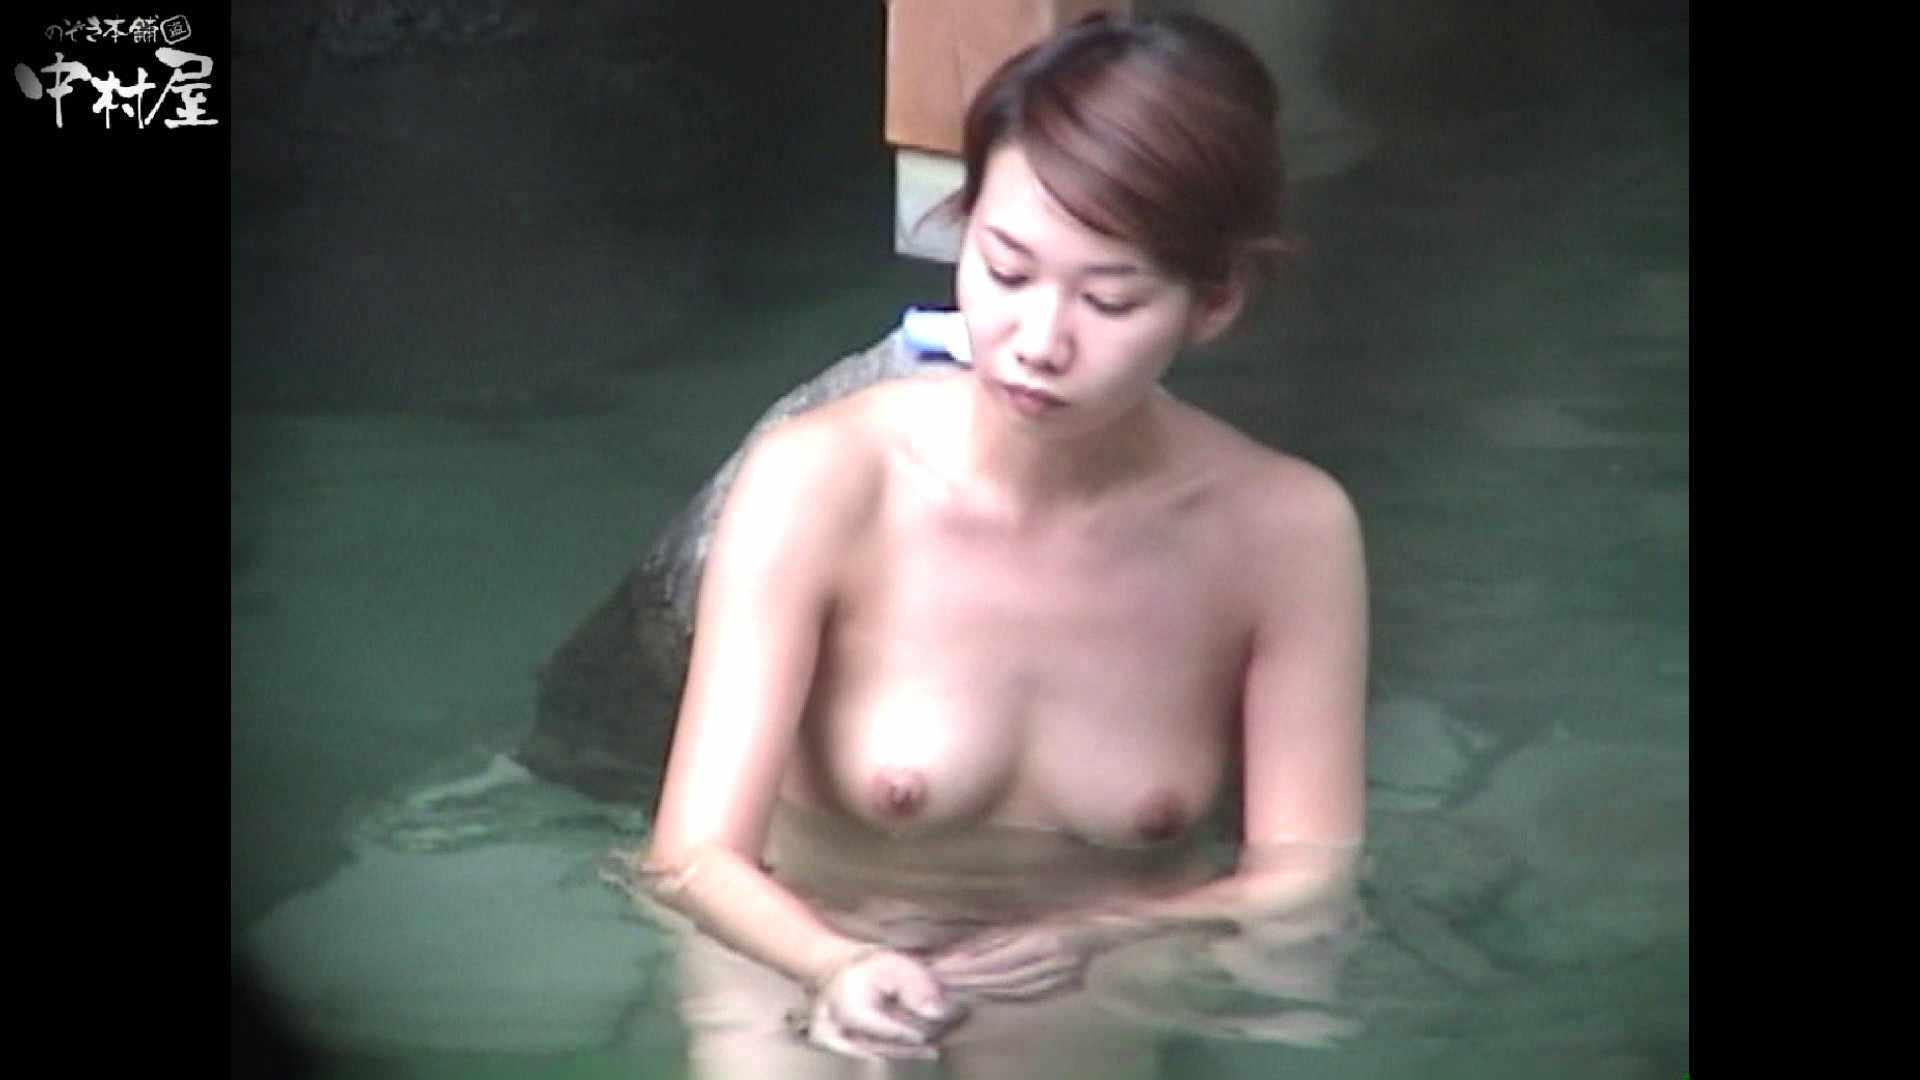 Aquaな露天風呂Vol.951 盗撮映像  93Pix 82